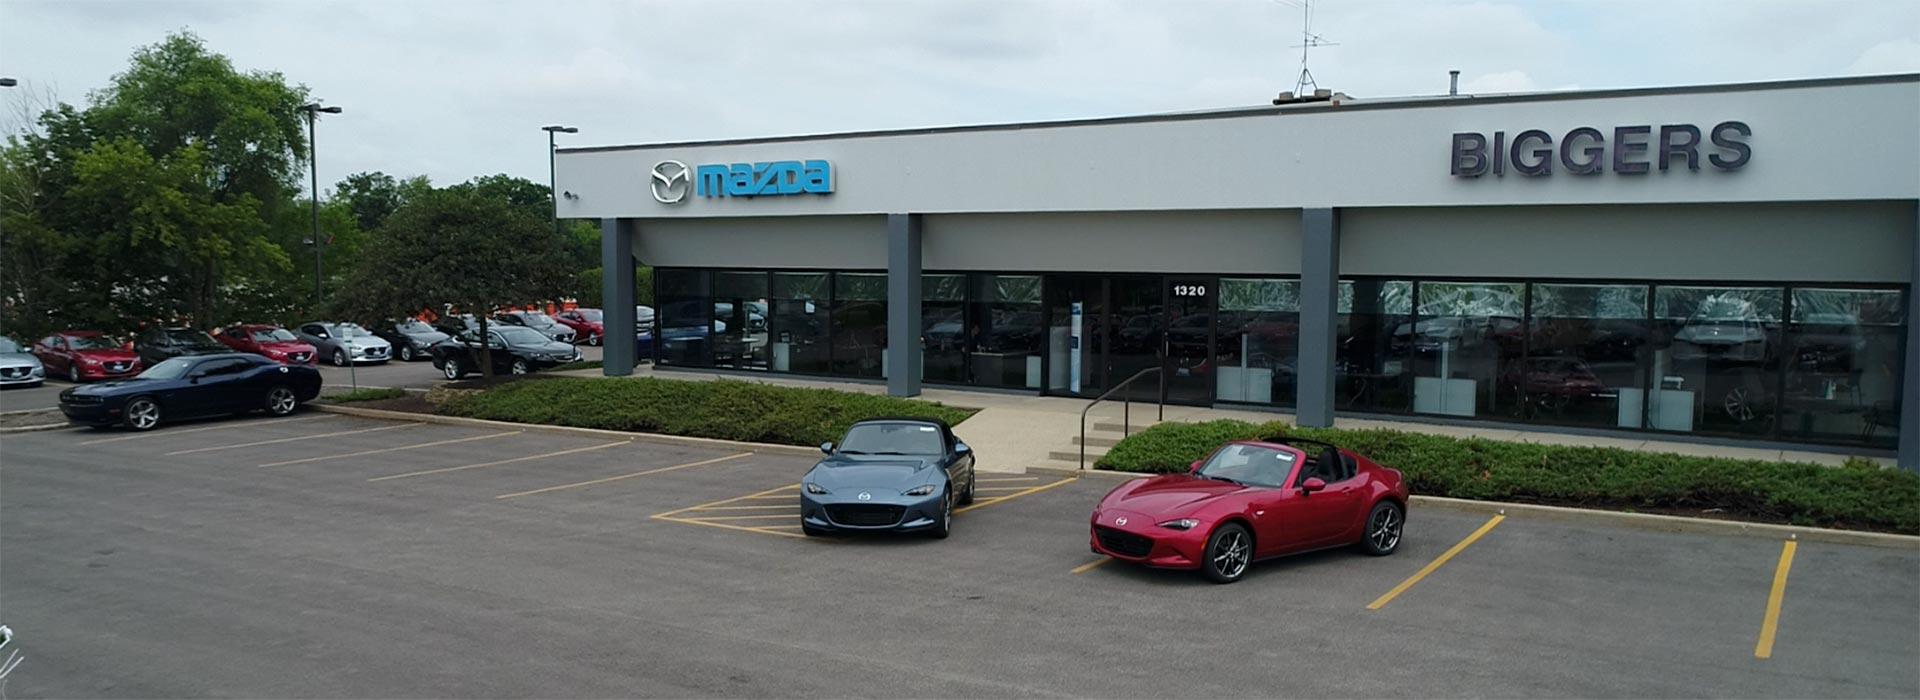 new harvey dealerskin brandt la mazda in ray dealer nearest specials o dealership winterevent latest